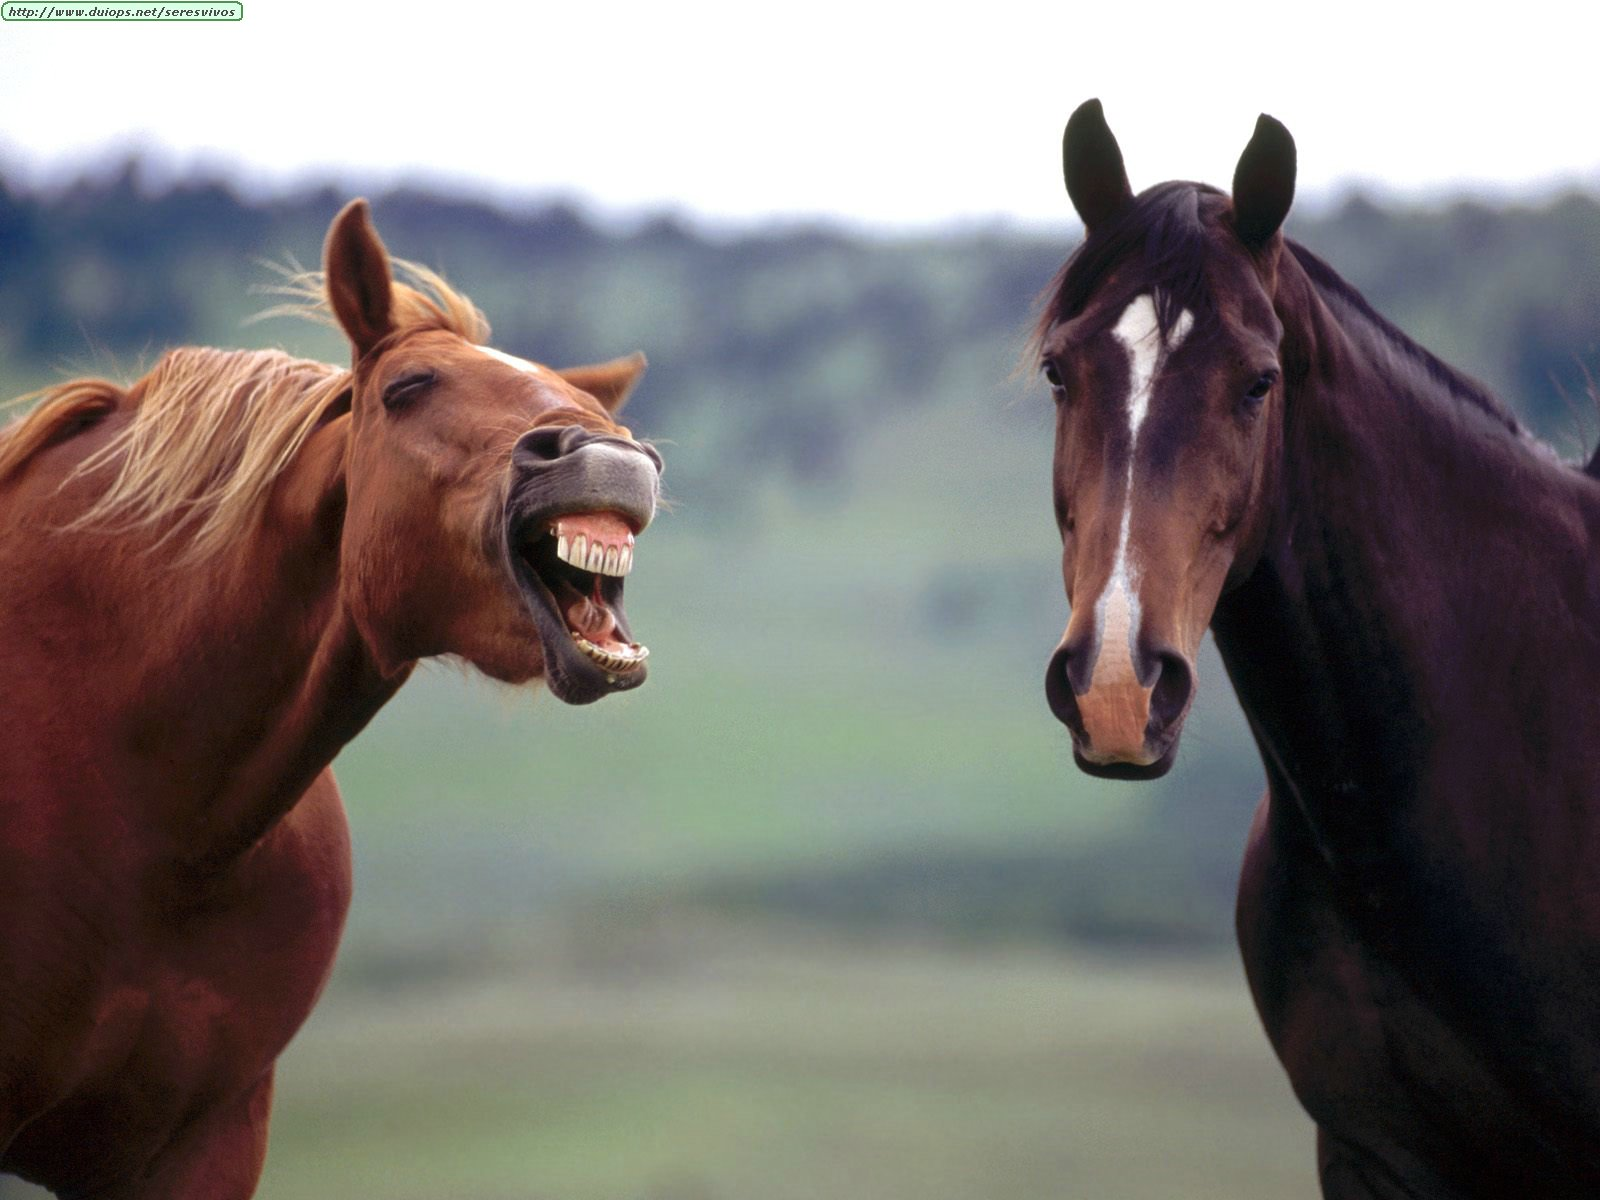 http://www.duiops.net/seresvivos/galeria/caballos/Animals%20Horses_Horse%20Play.jpg